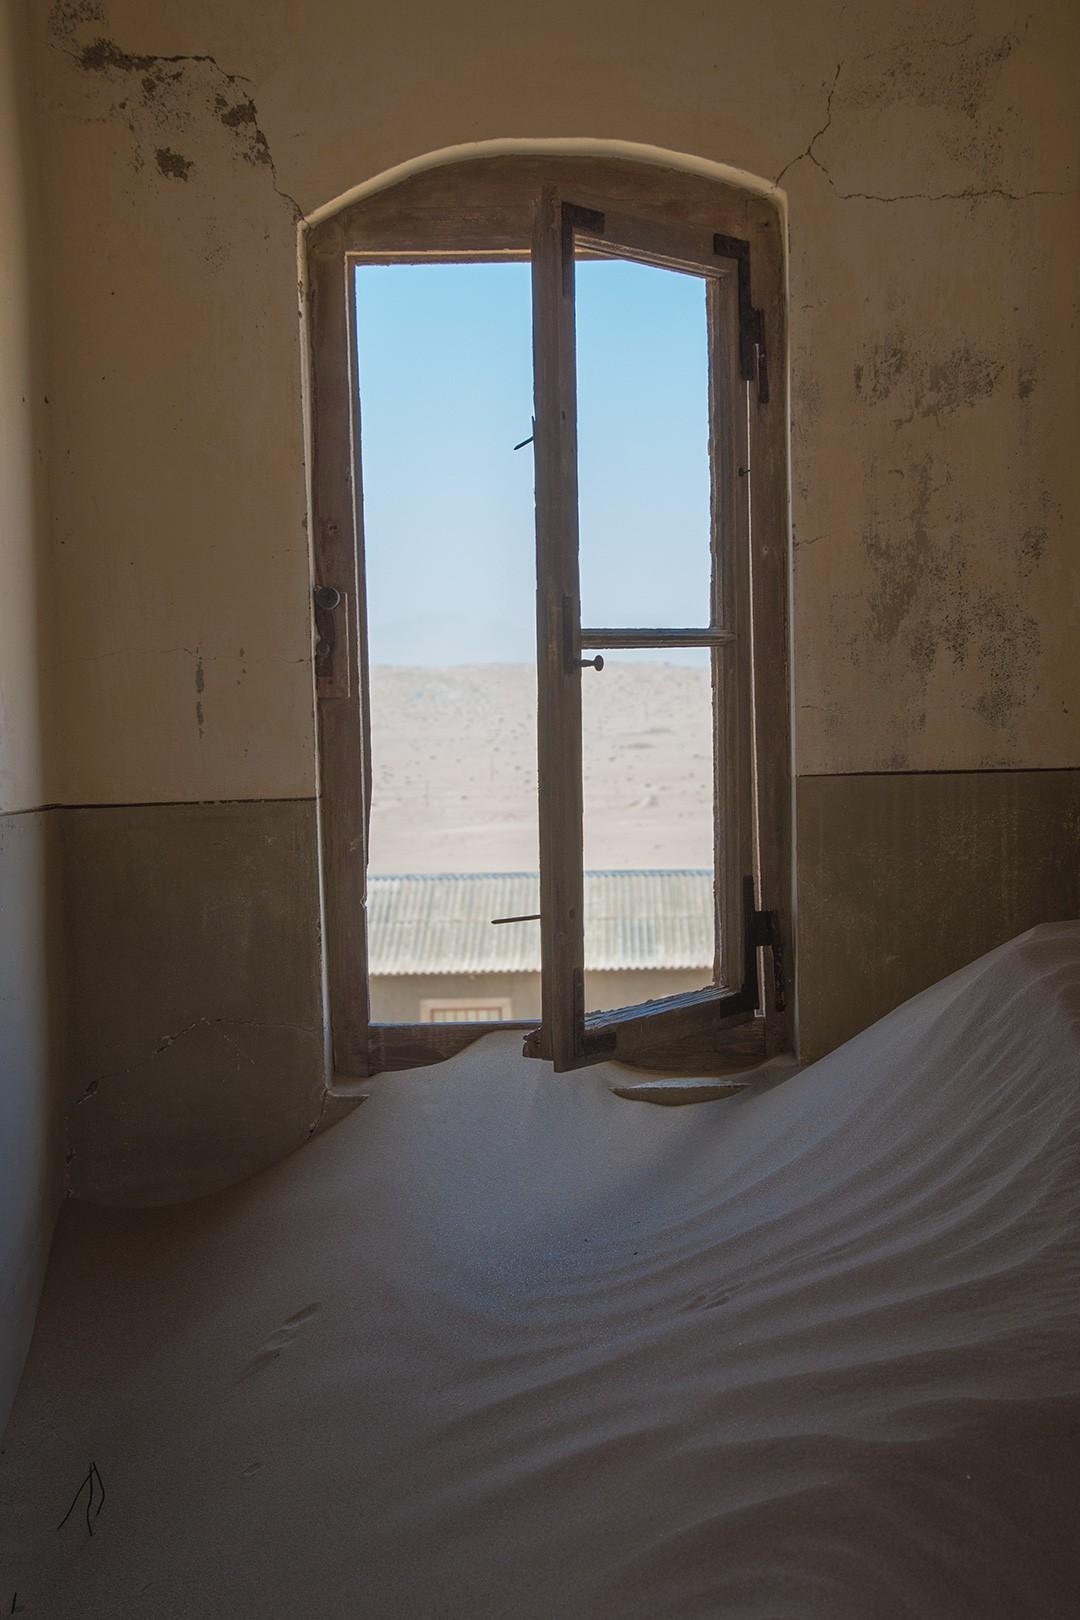 window frame at kolmanskop ghost town in namibia